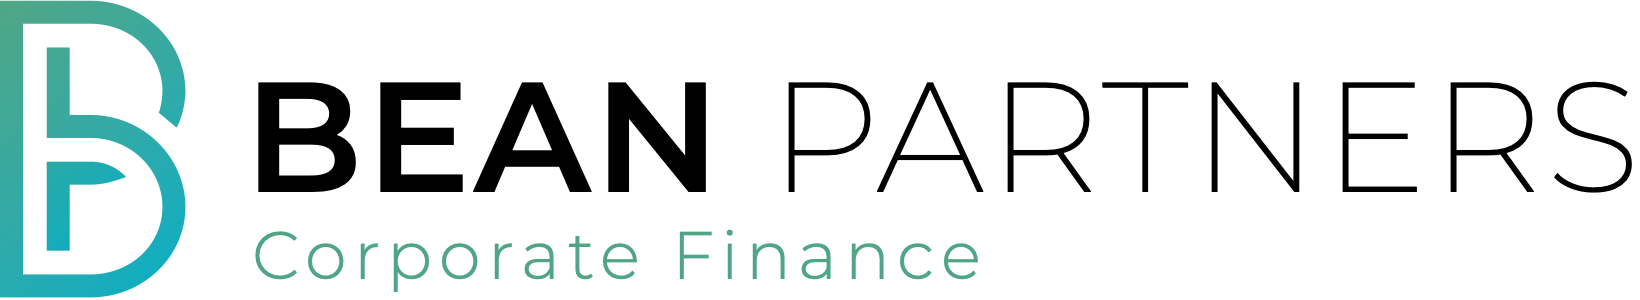 BEAN Partners Logo